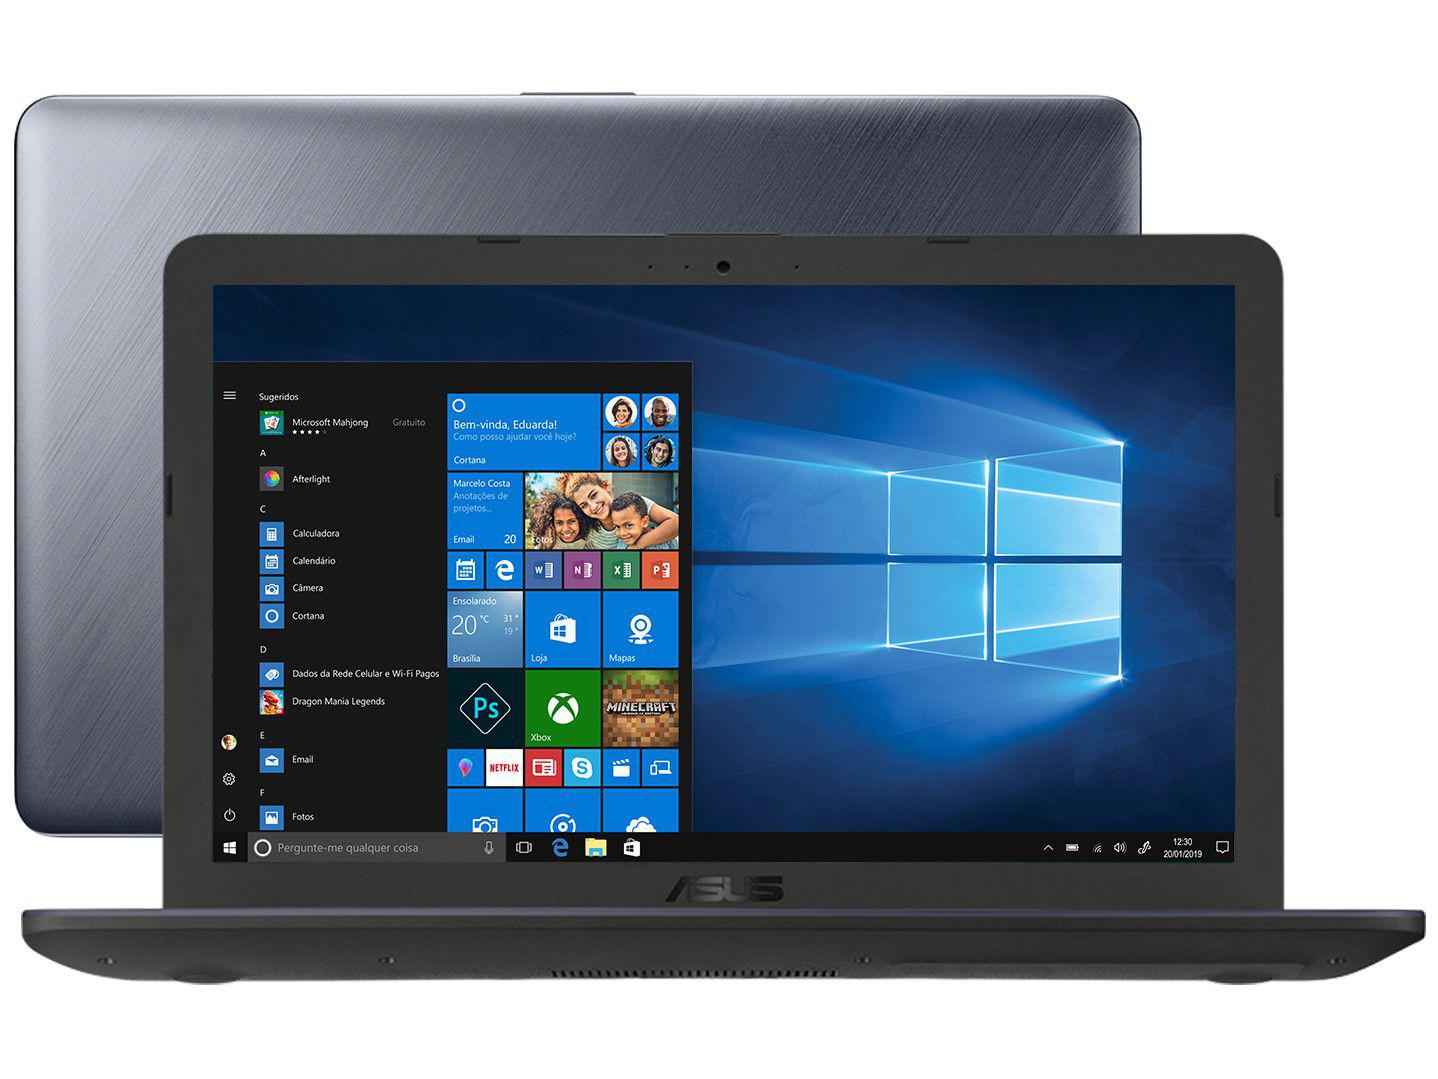 "Notebook Asus VivoBook X543UA-DM3457T - Intel Core i5 8GB 256GB SSD 15,6"" Full HD LED"